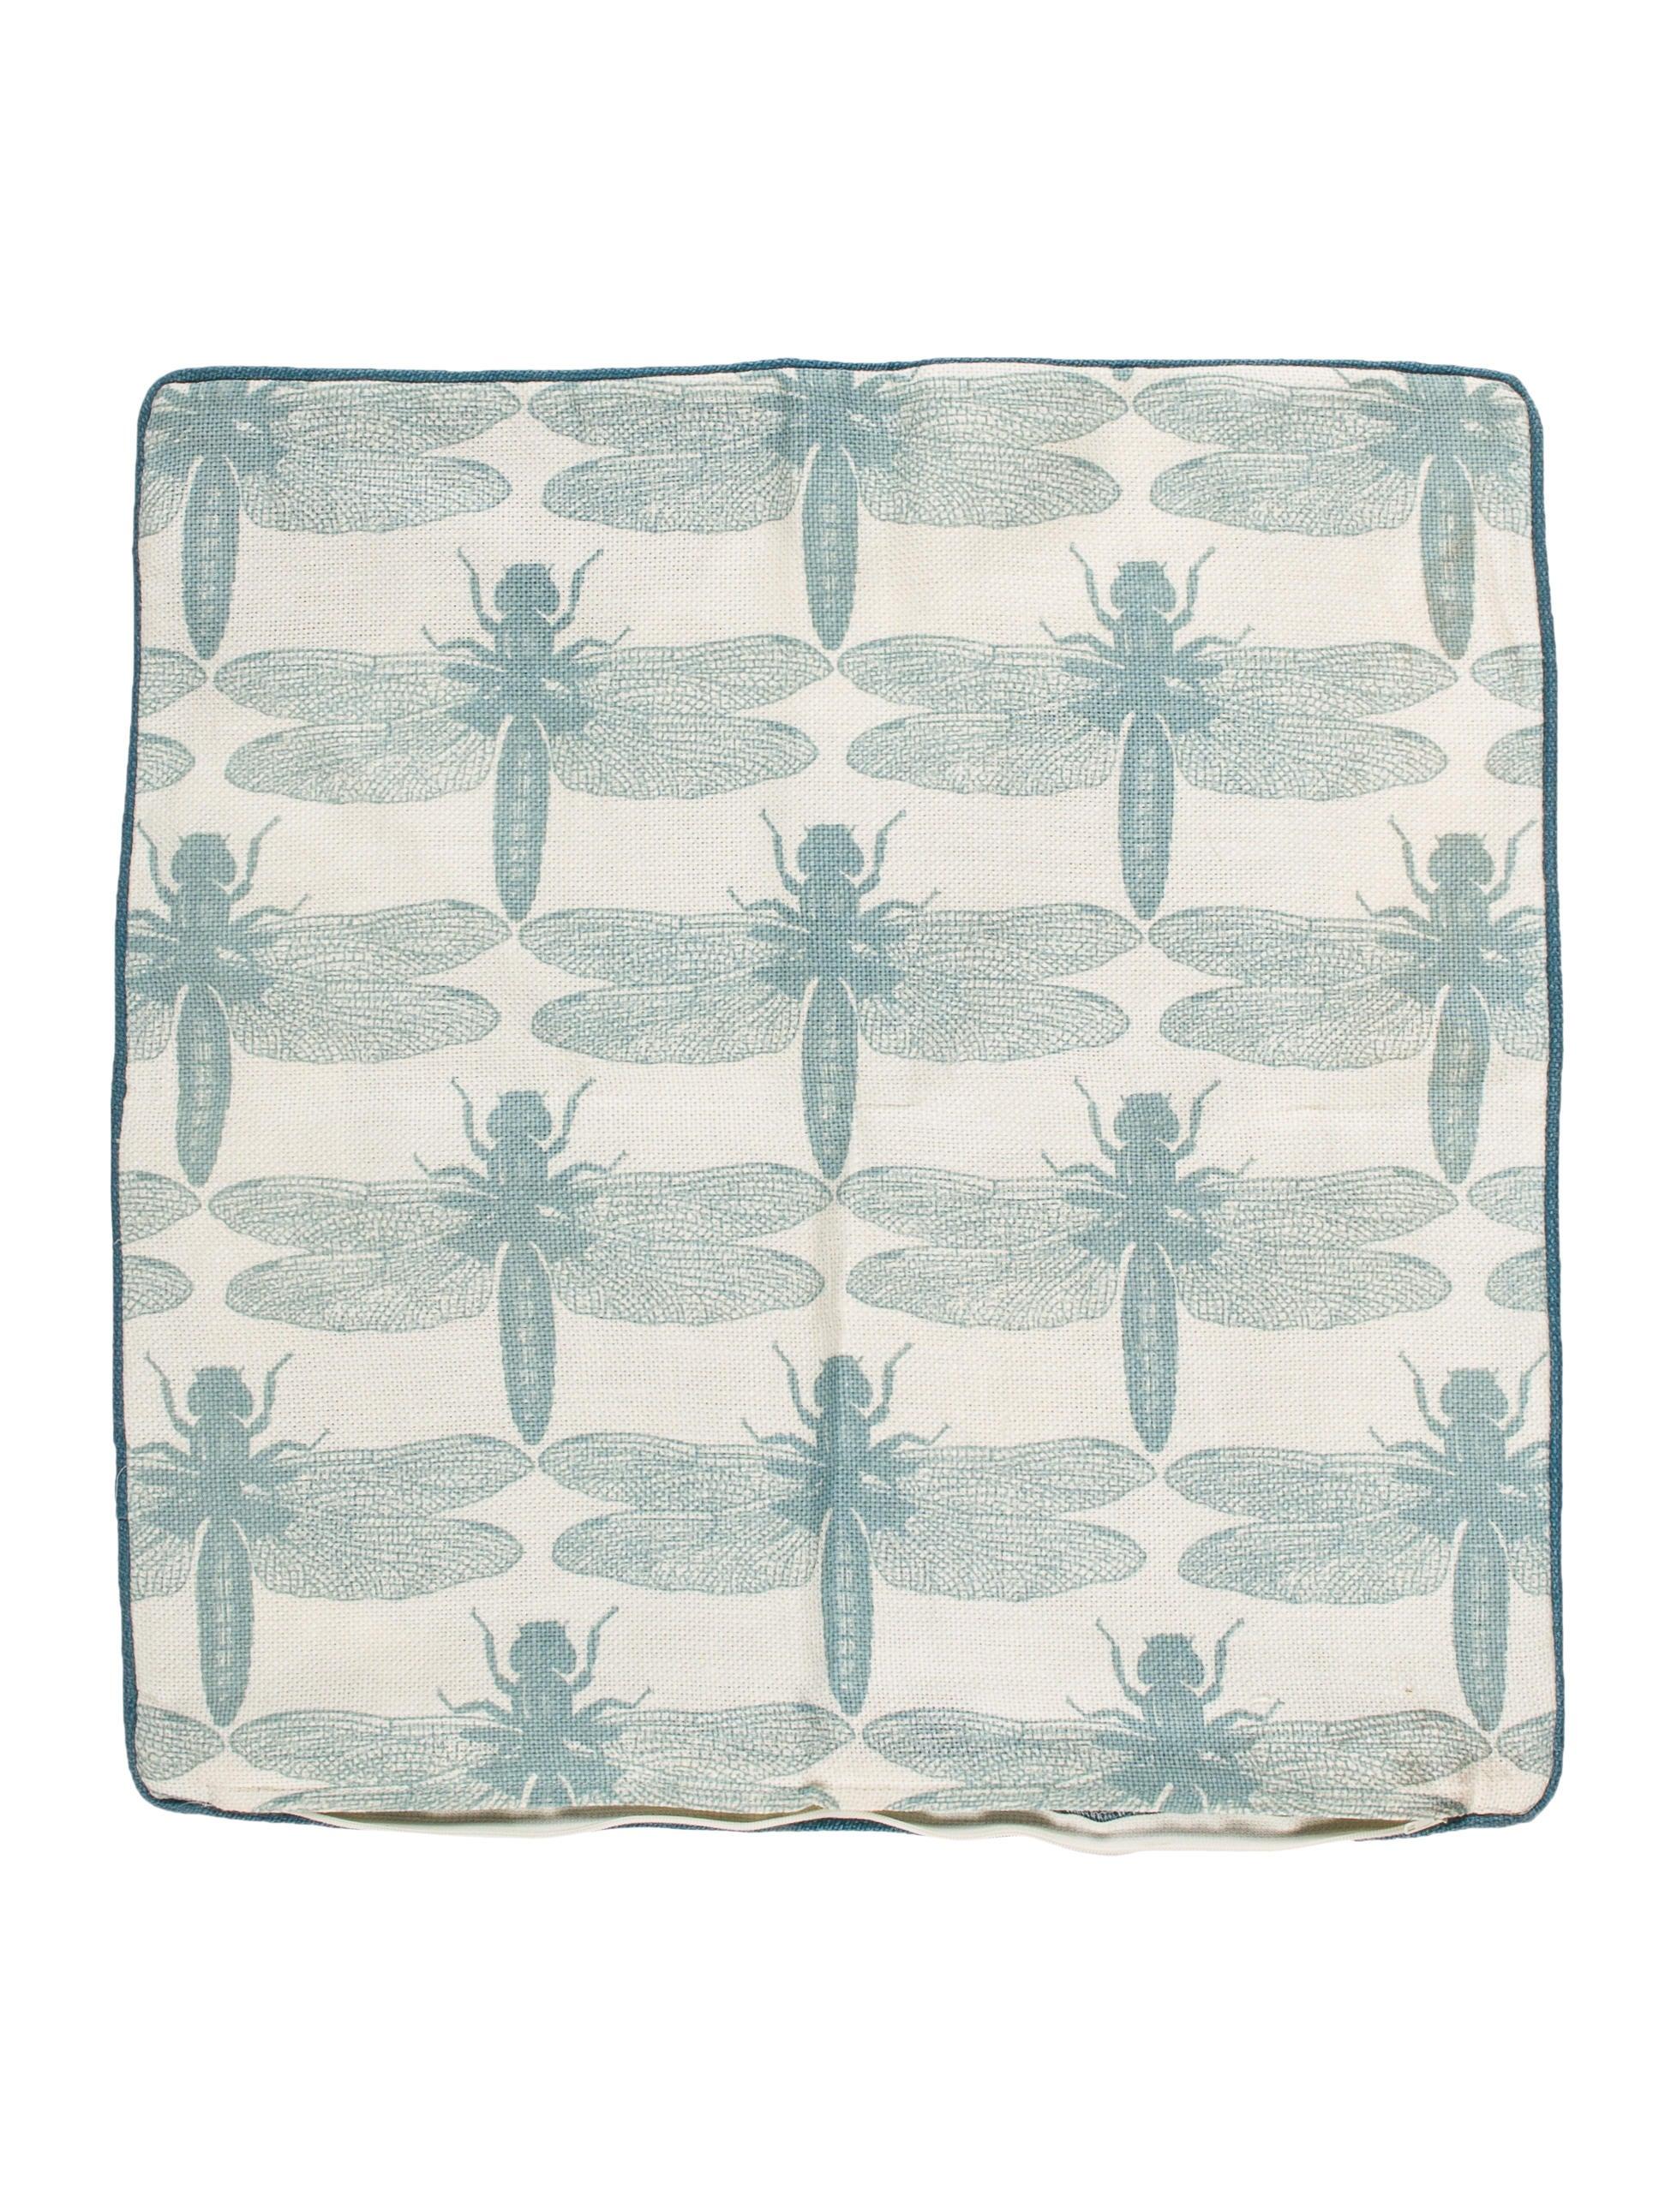 Thomaspaul Linen Throw Pillow Case - Pillows And Throws - PILLO20359 The RealReal